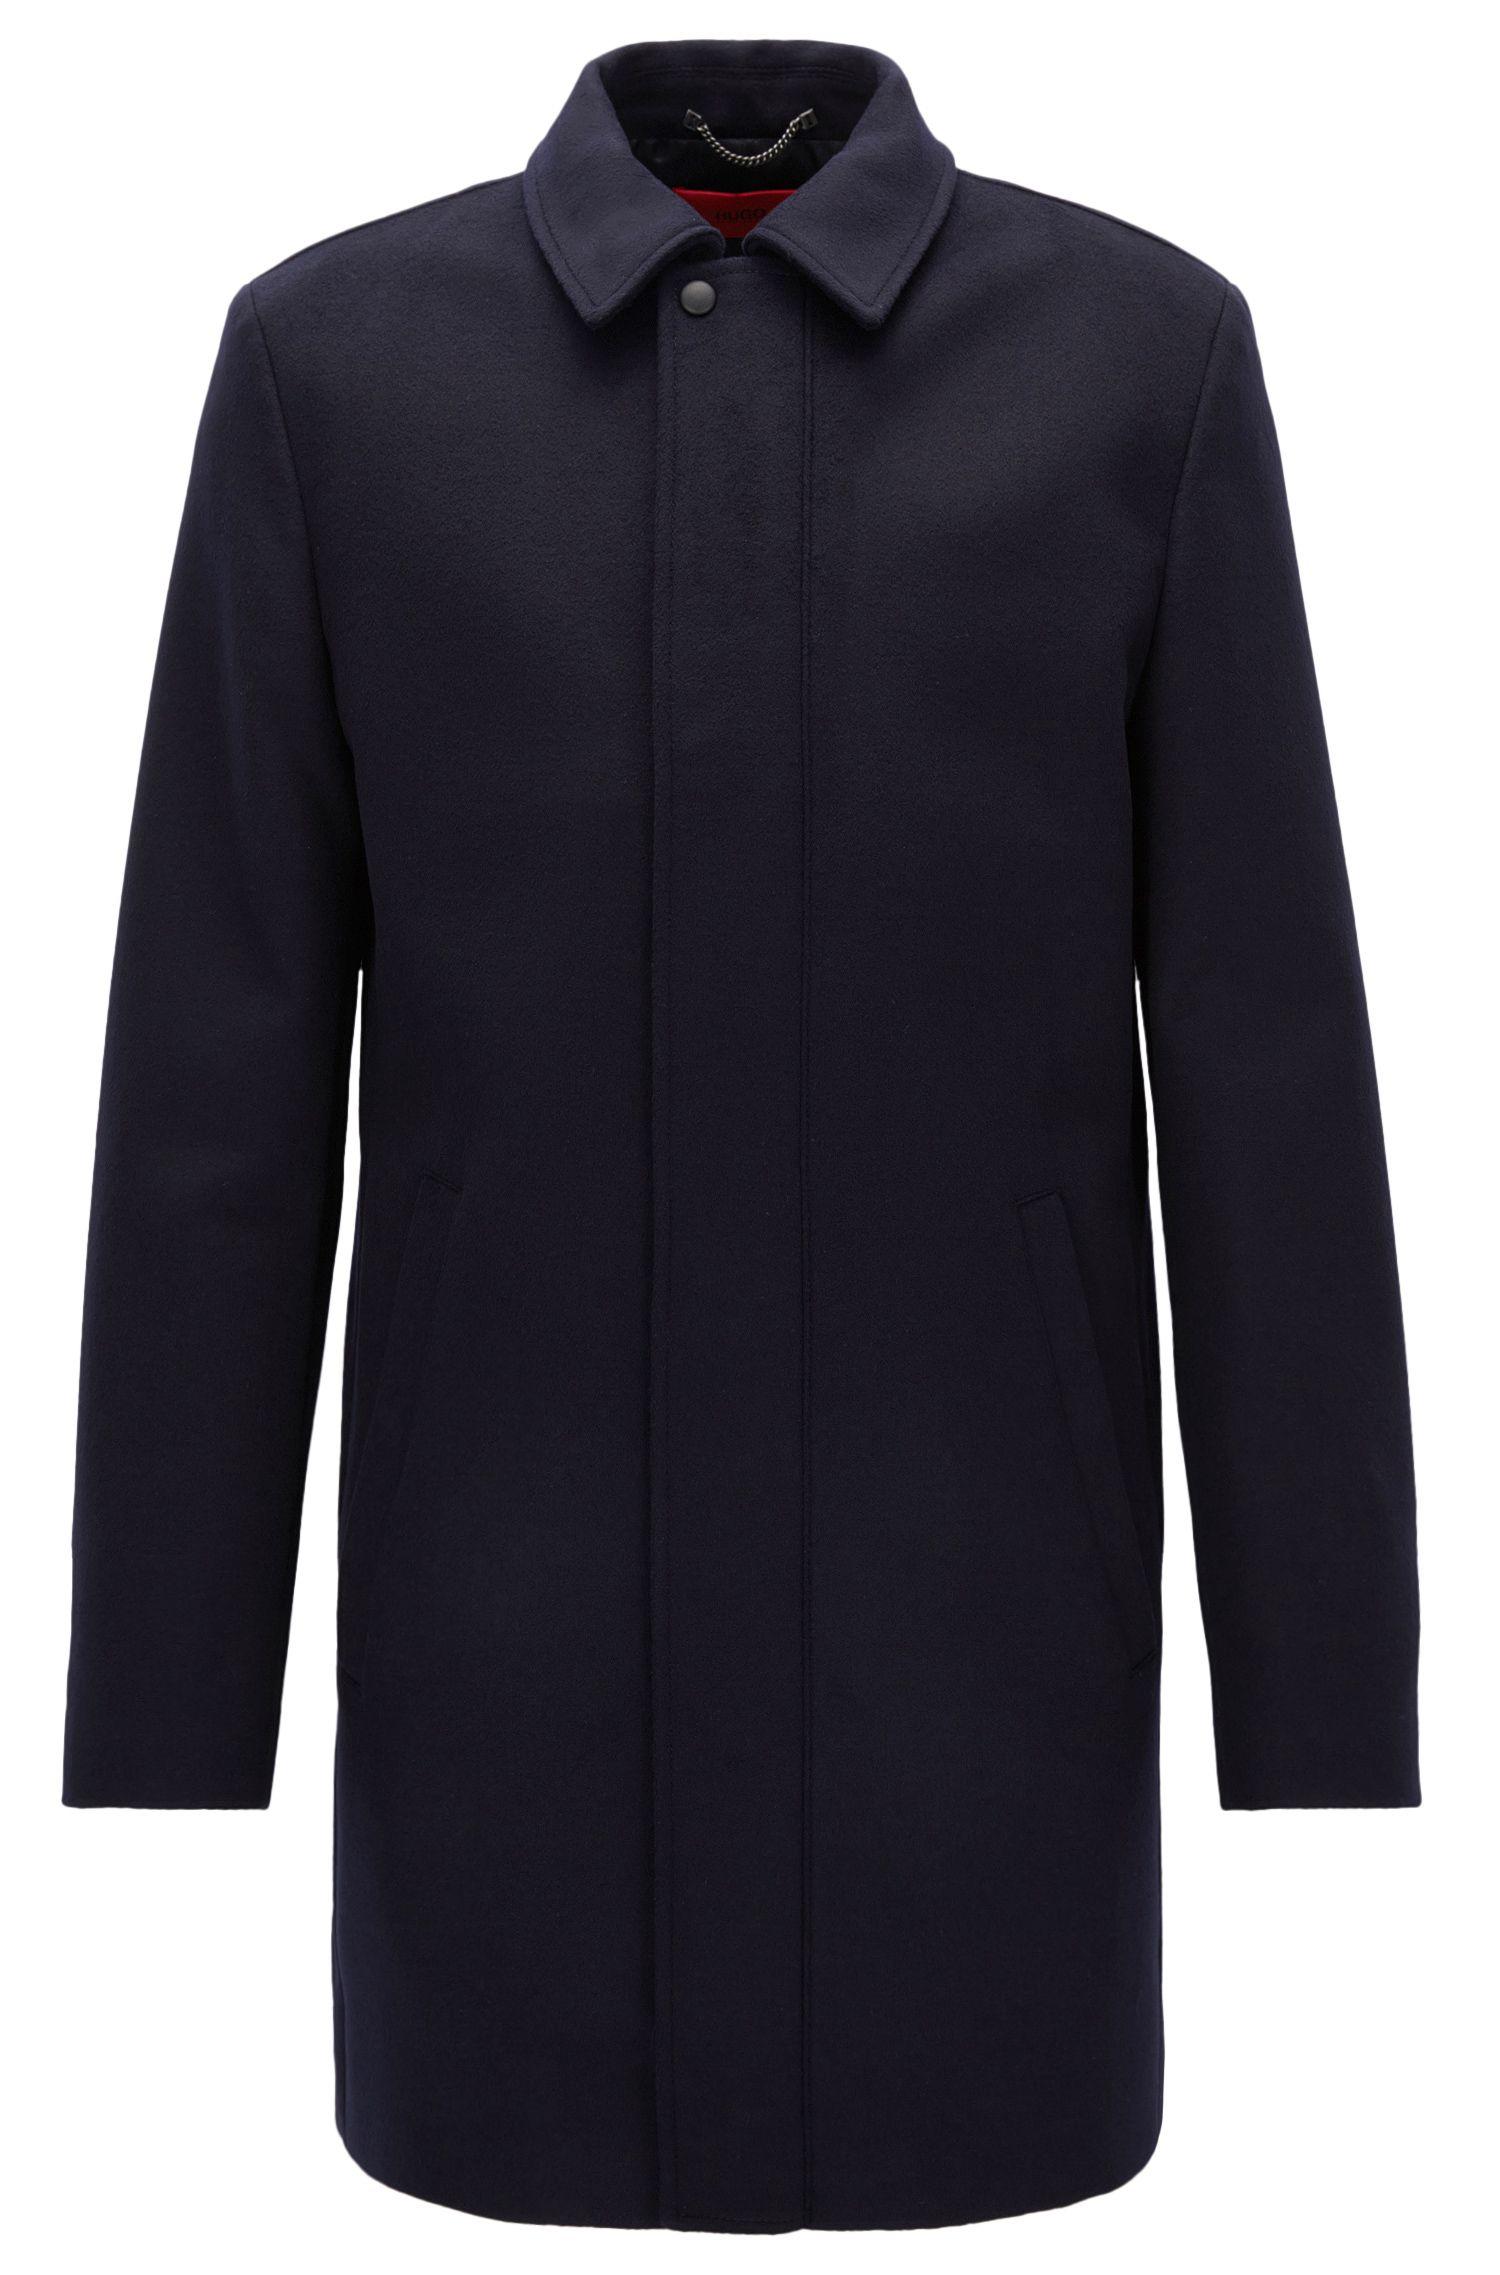 Cappotto slim fit in misto lana vergine